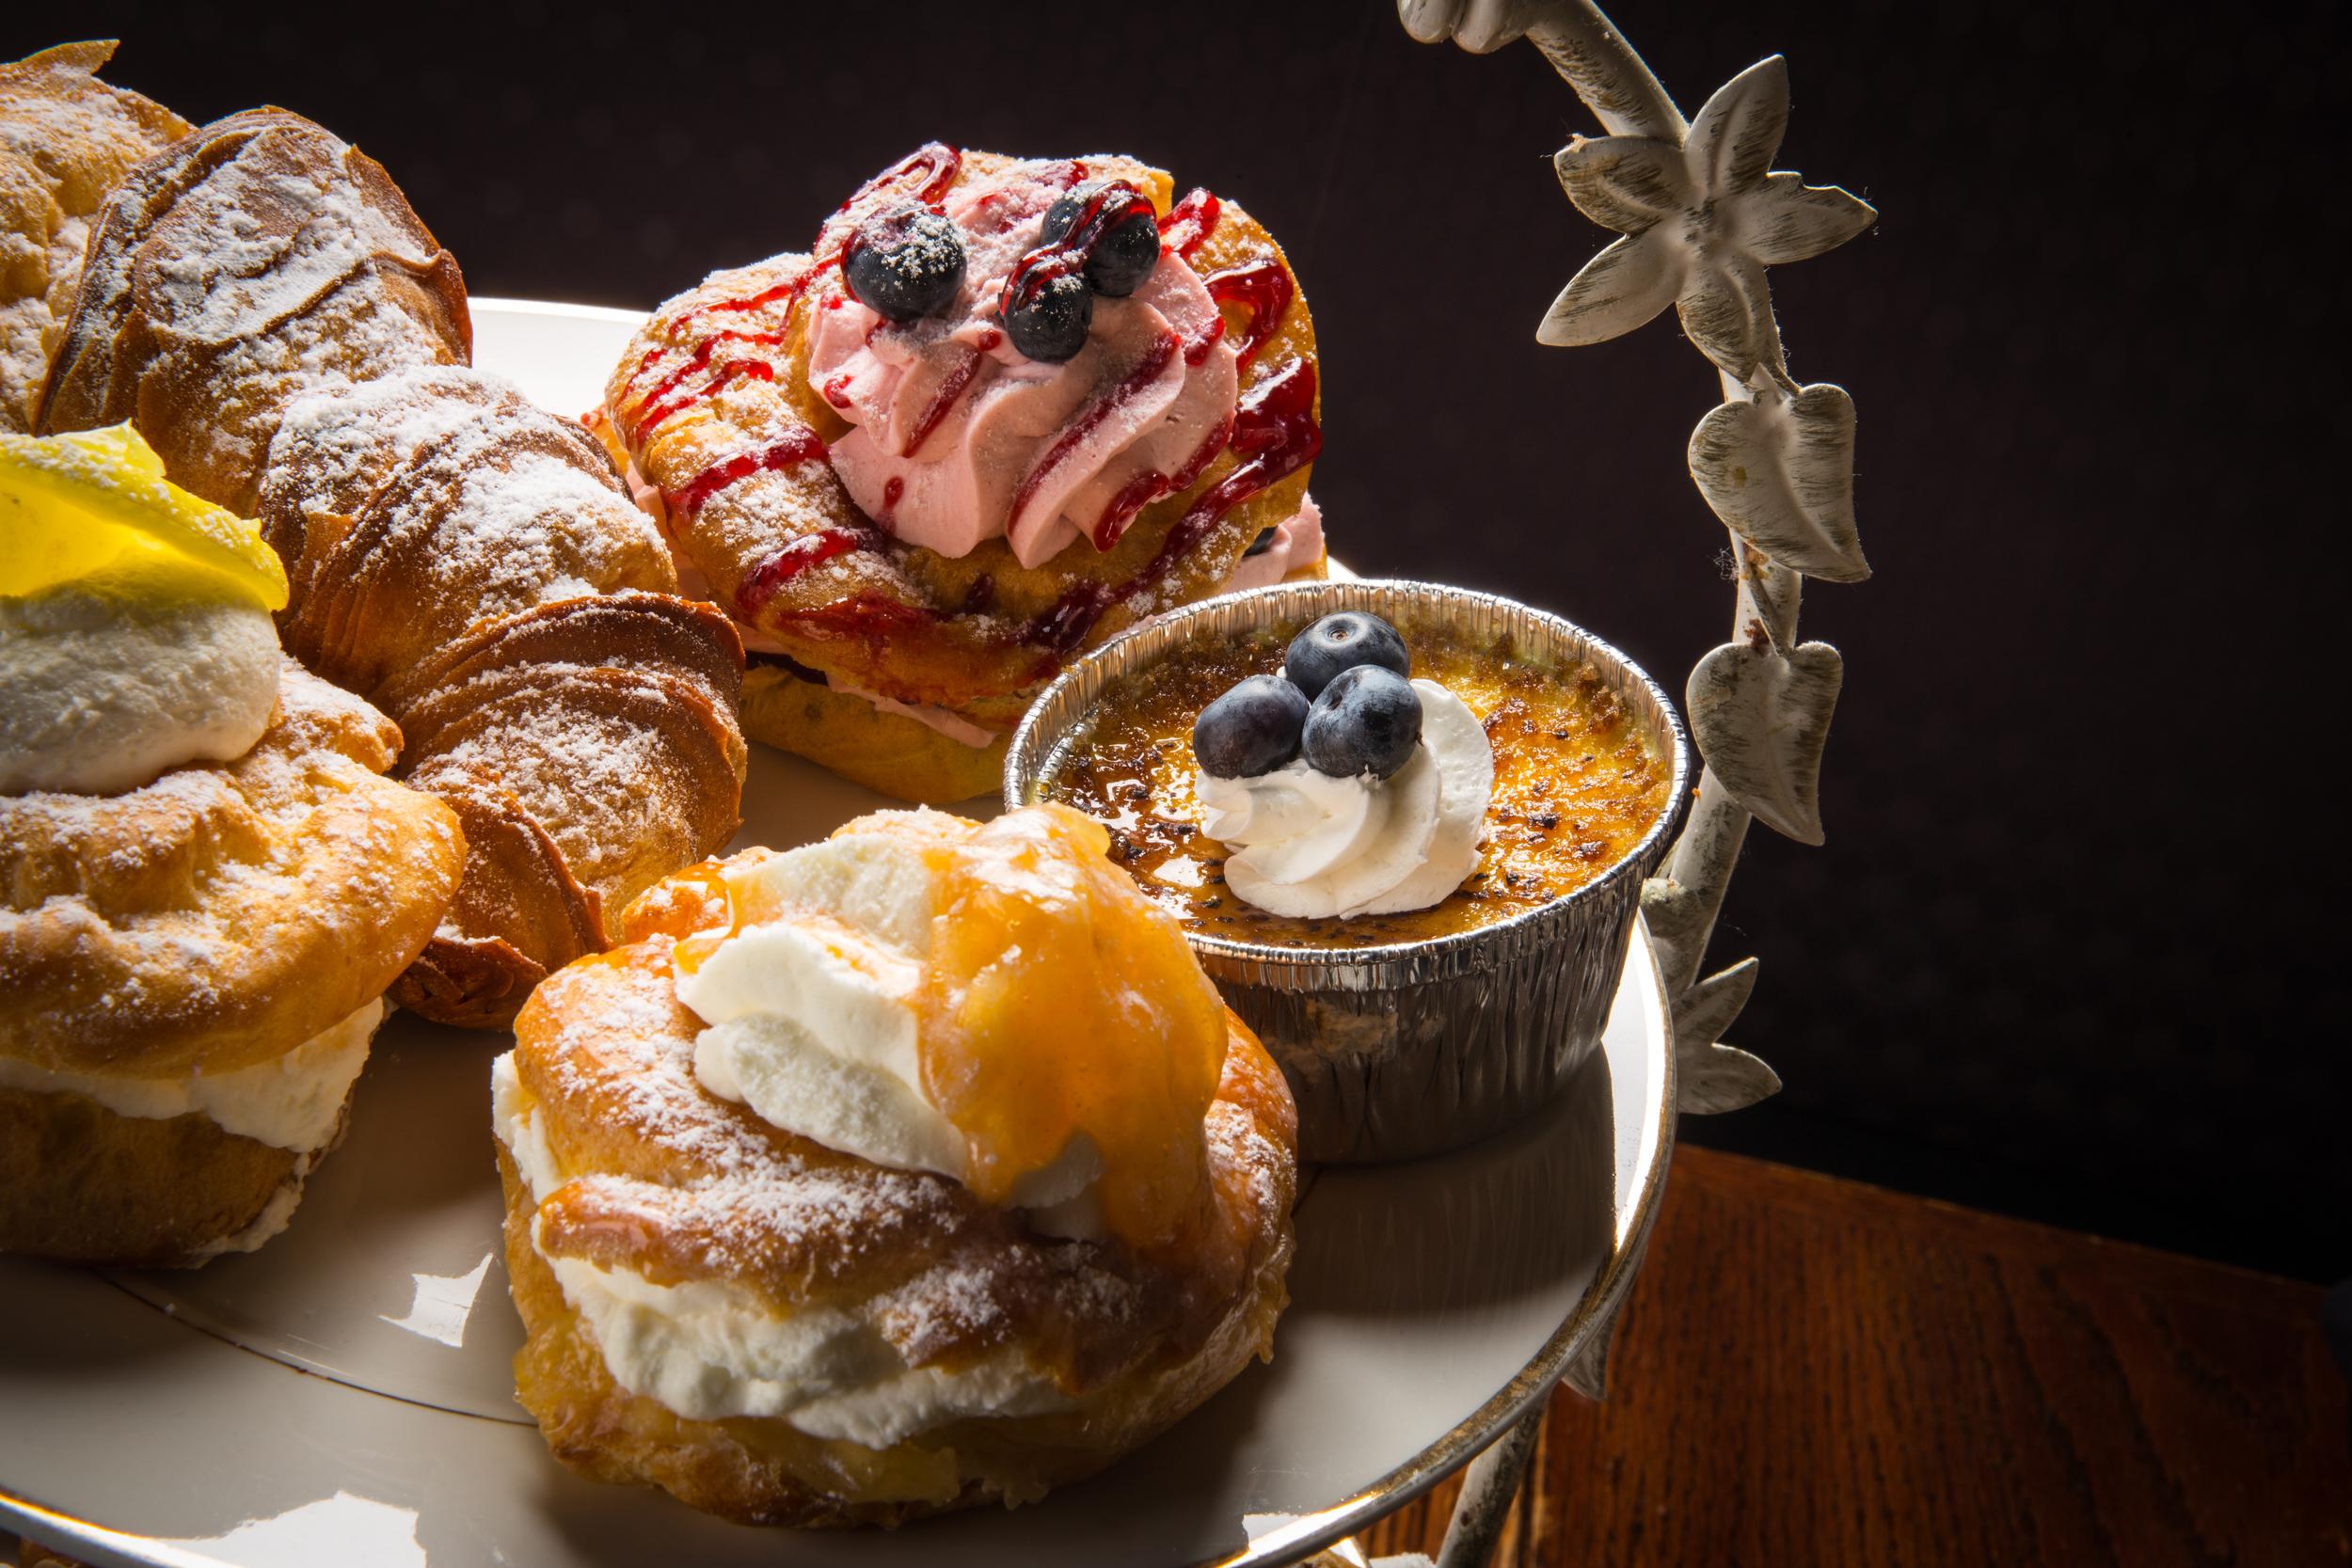 Cafe Canole Desserts